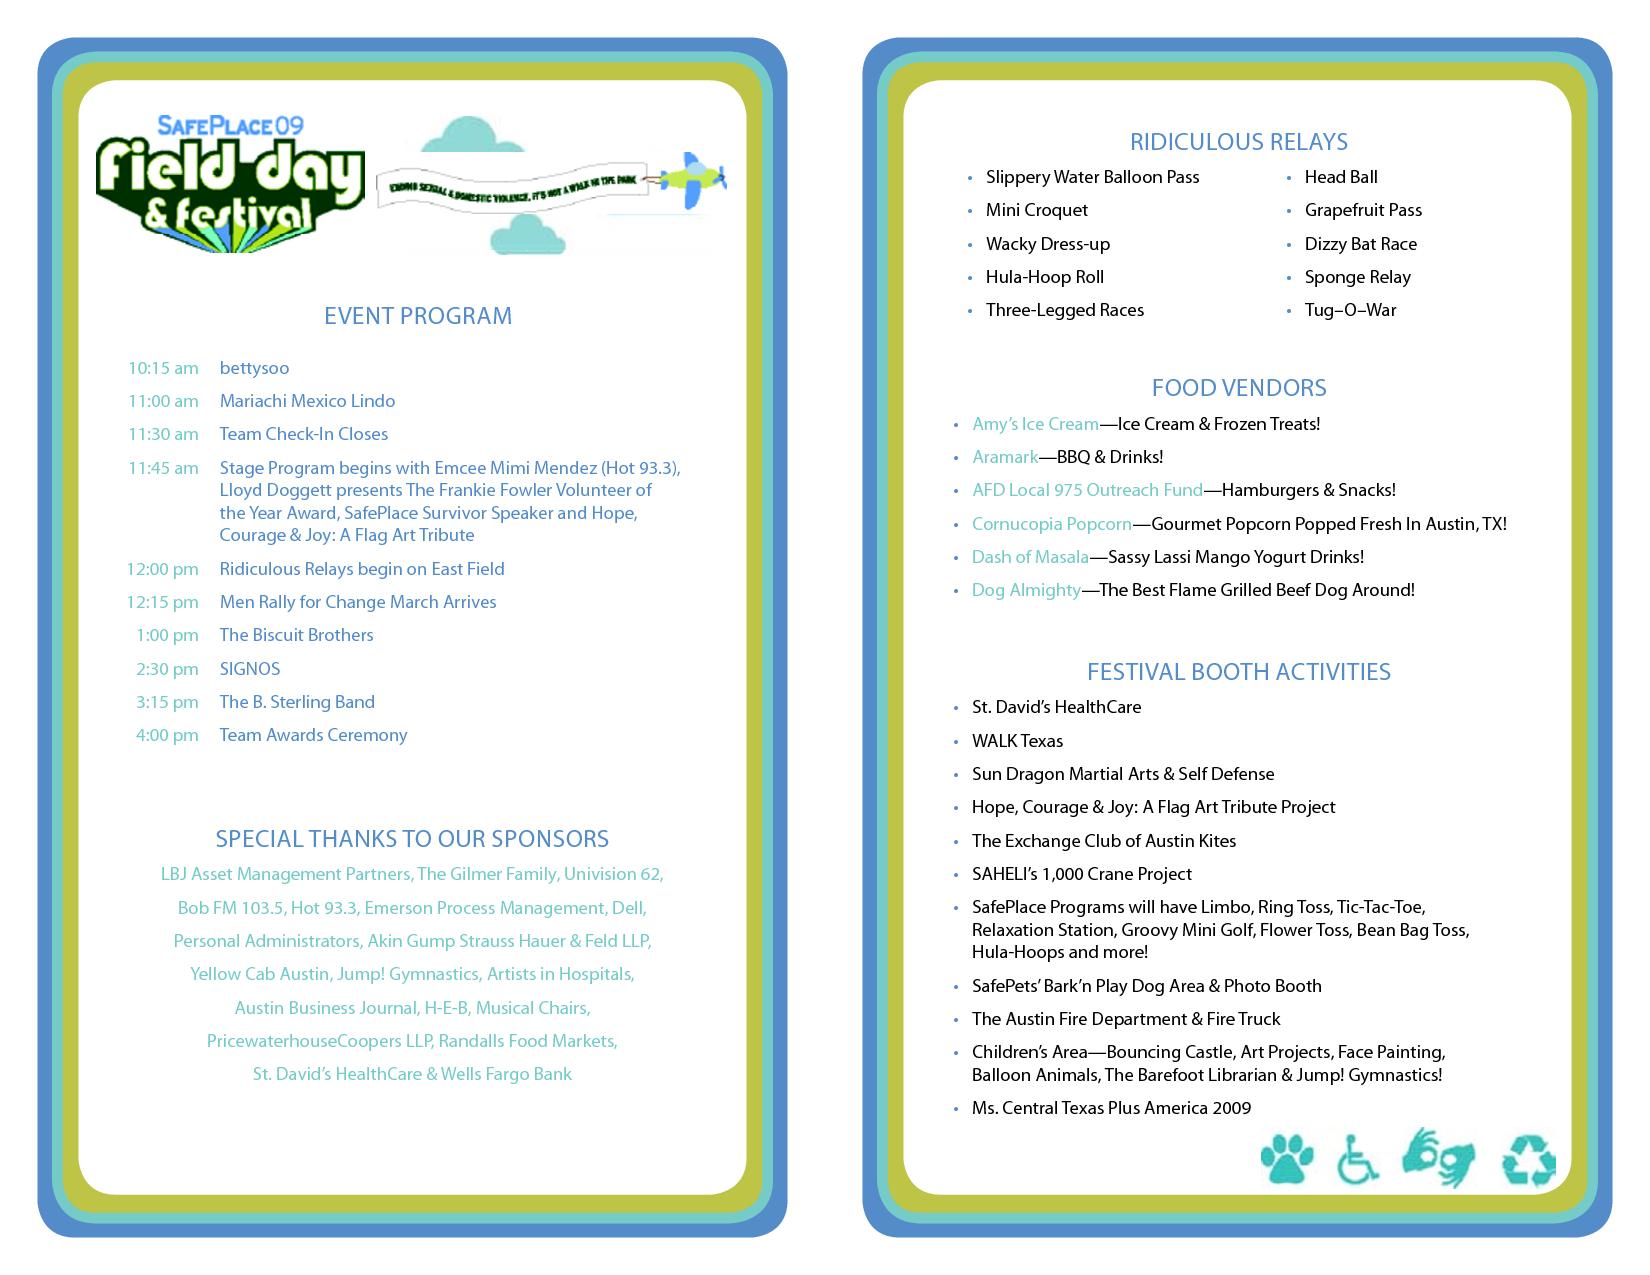 029 Sample Event Program Template 1926 Free Printable Regarding Free Event Program Templates Word